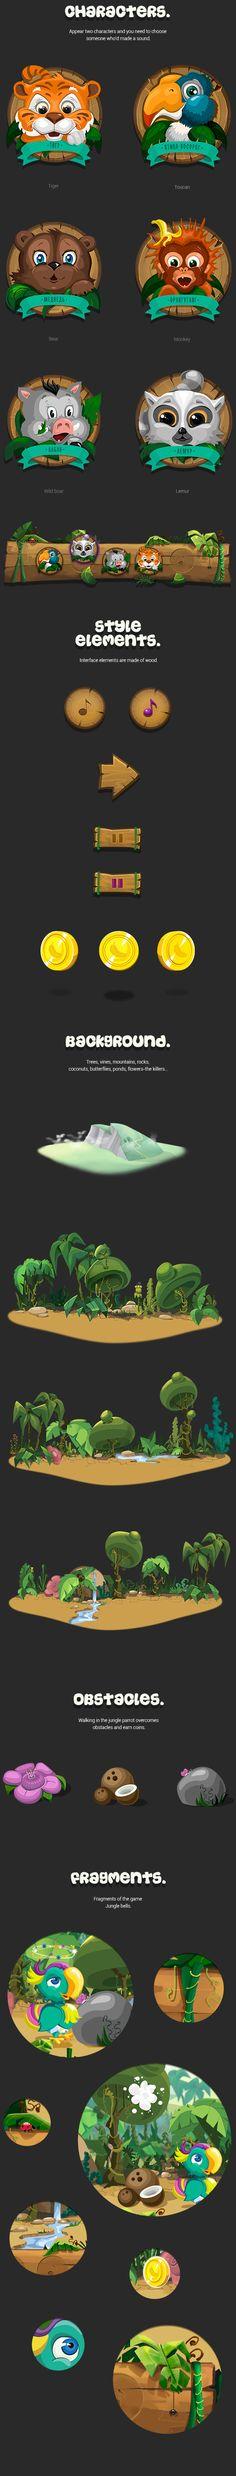 Jungle Bells Game on Behance